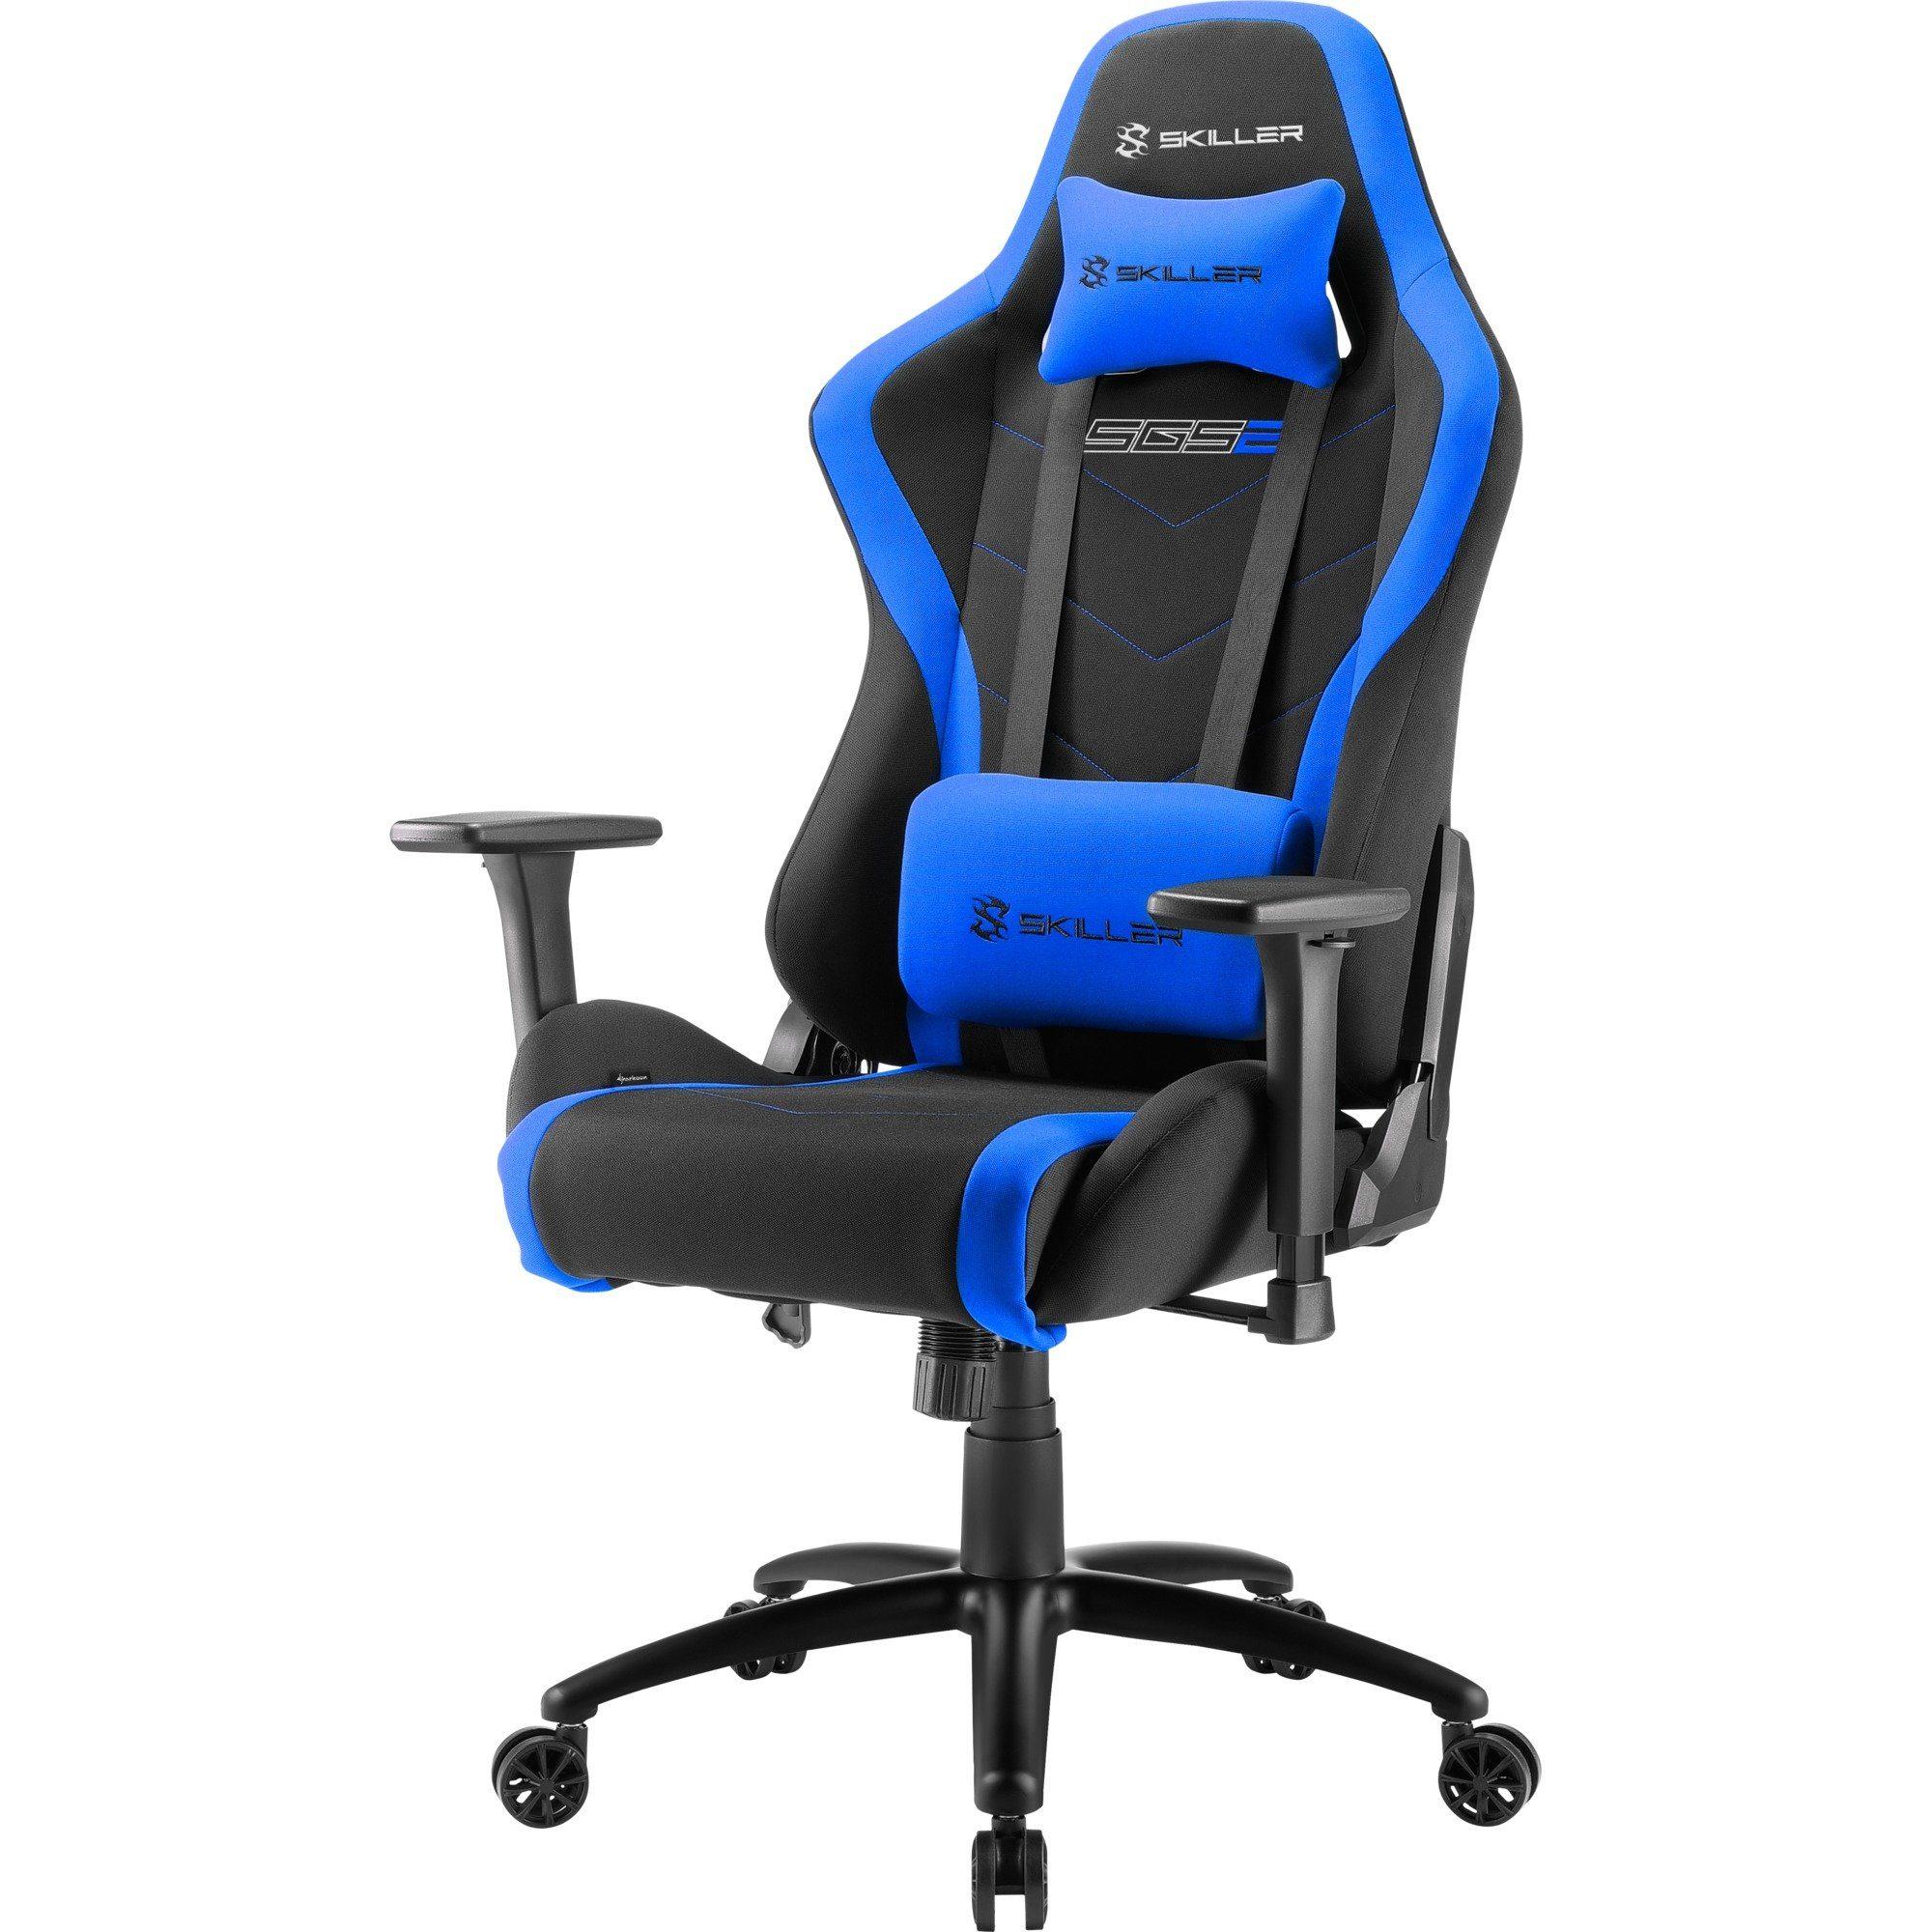 Sharkoon Spielsitz Skiller SGS2 Gaming Seat  OTTO